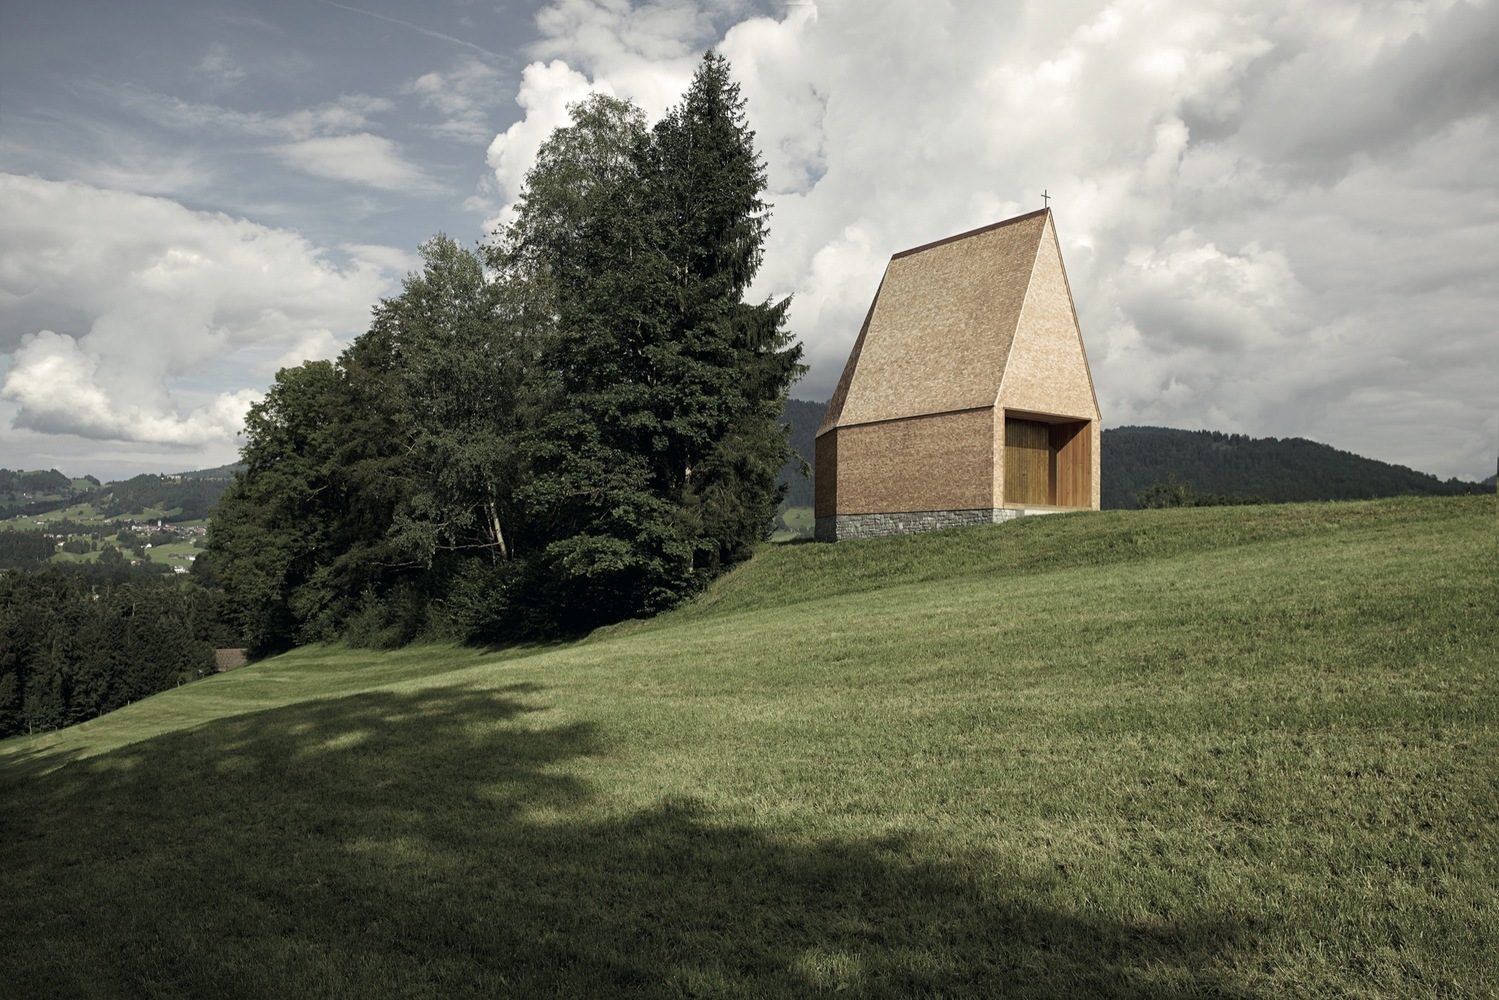 7_Kapelle Salgenreute_Bernardo Bader Architekten_Inspirationist